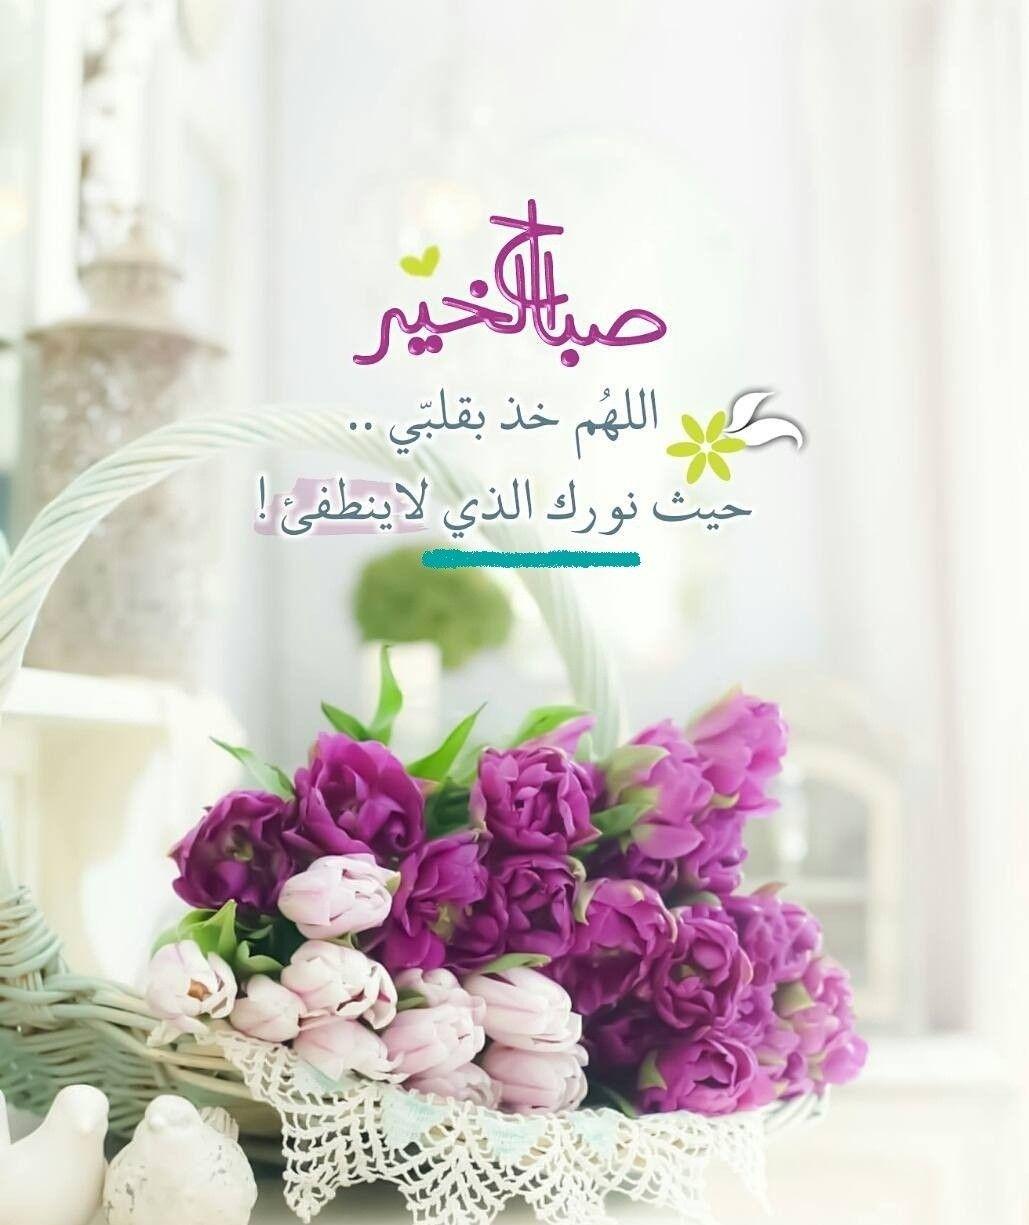 صباح مكتوب بماء الألماس Good Morning Images Morning Images Beautiful Flowers